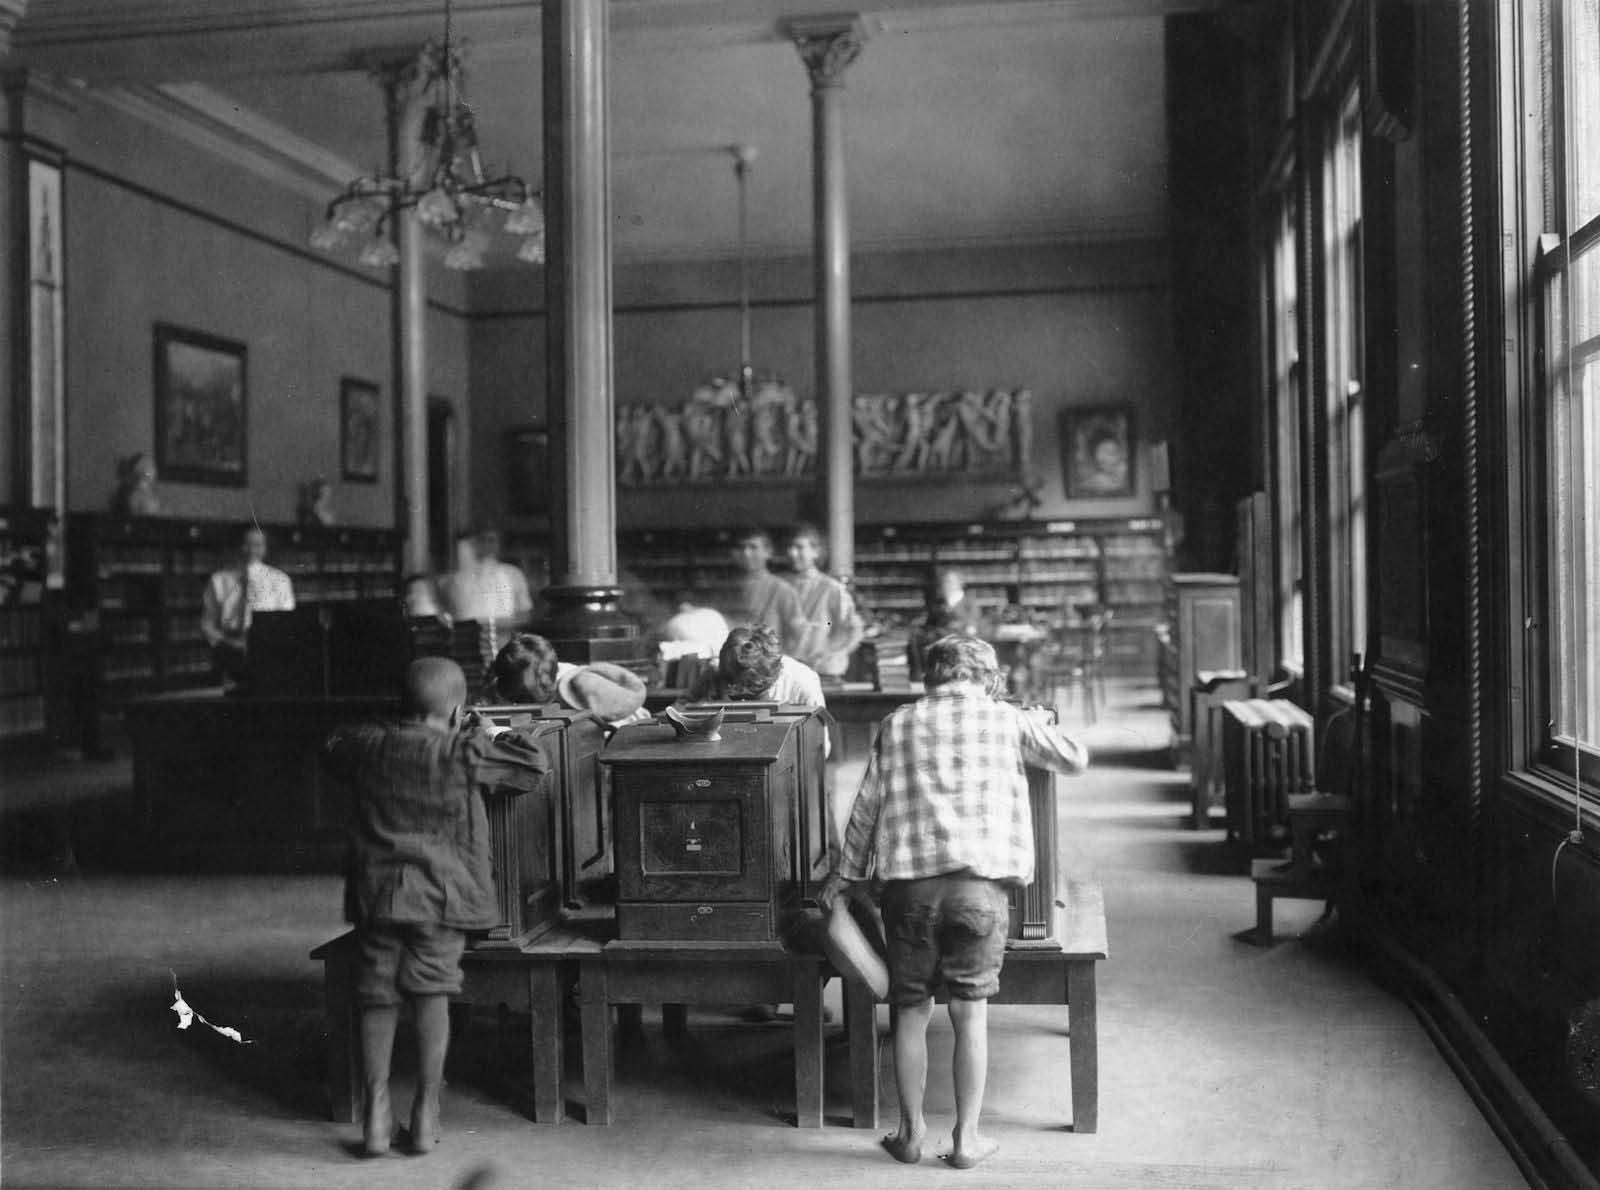 ex pegno cincinnati Liotèque prima di essere demolito, 1874-1955'Ancien Cincinnati Bibliothèque avant d'être démoli, 1874-1955